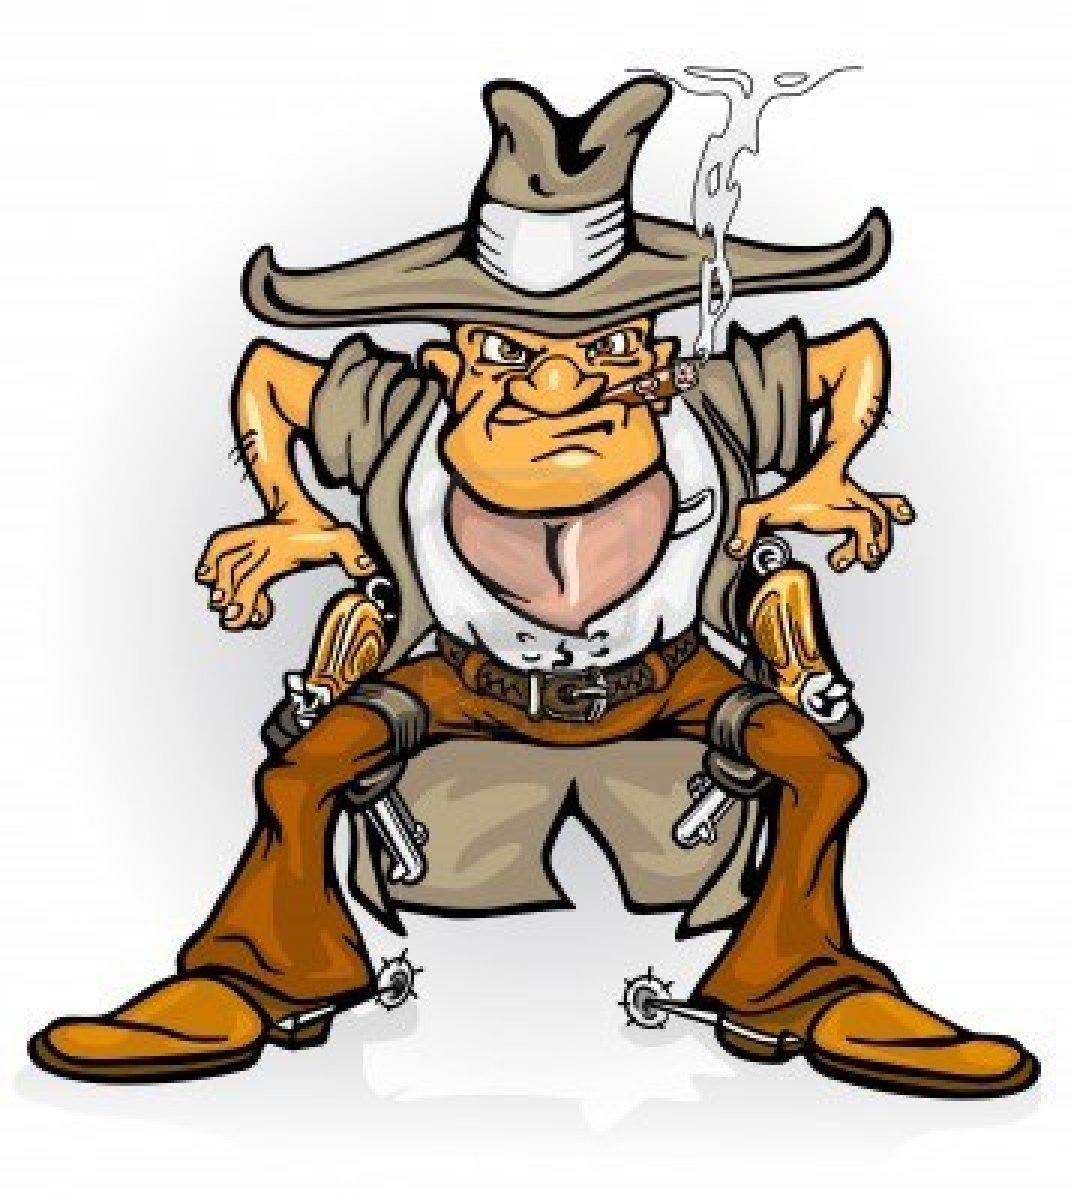 Wild Cowboy Mascot